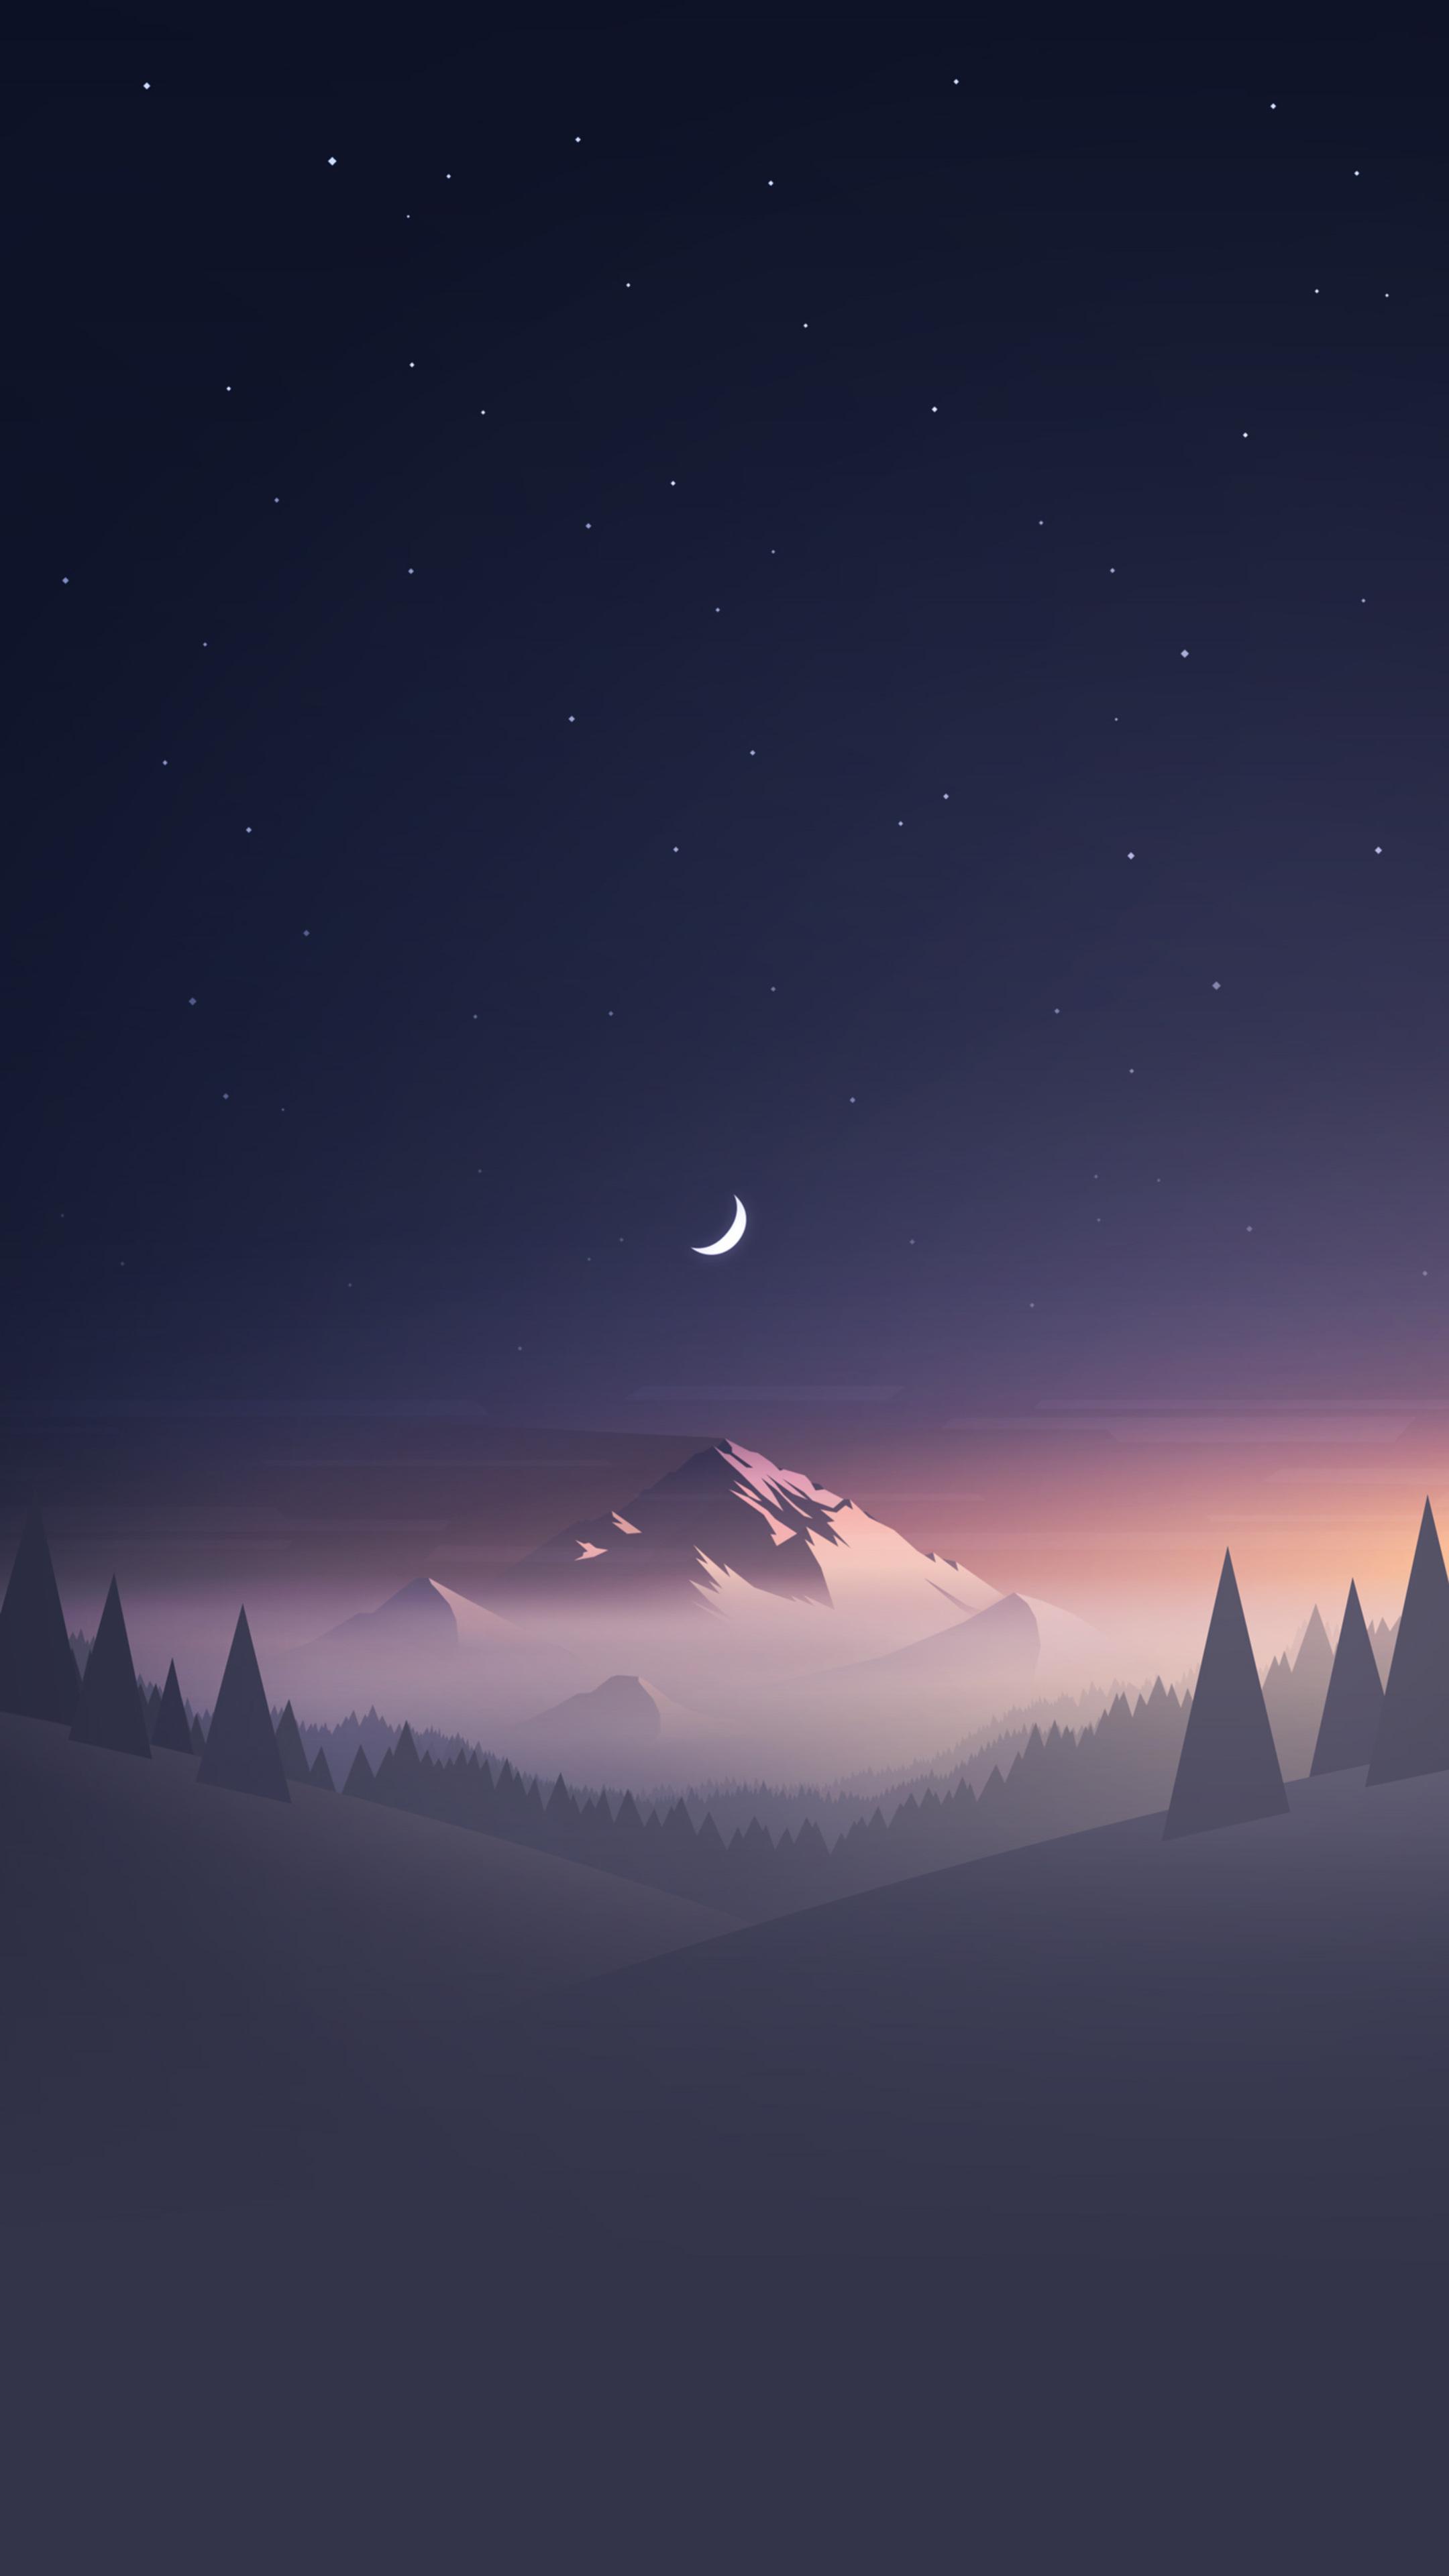 2160x3840 mountains moon trees minimalism sony xperia x xz - Art wallpaper 2160x3840 ...